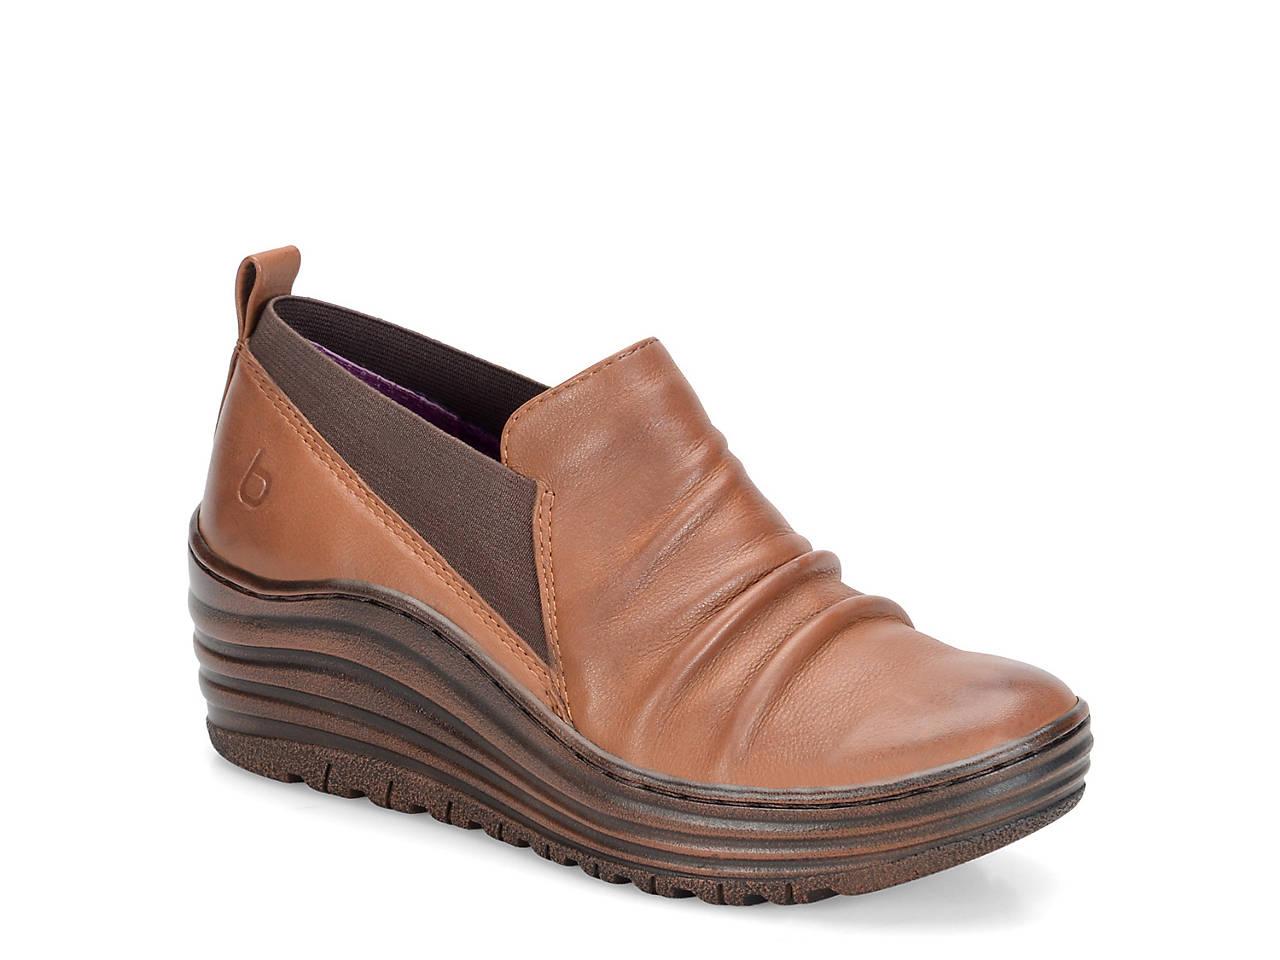 BIONICA Women's 'Gallant' Leather Bootie